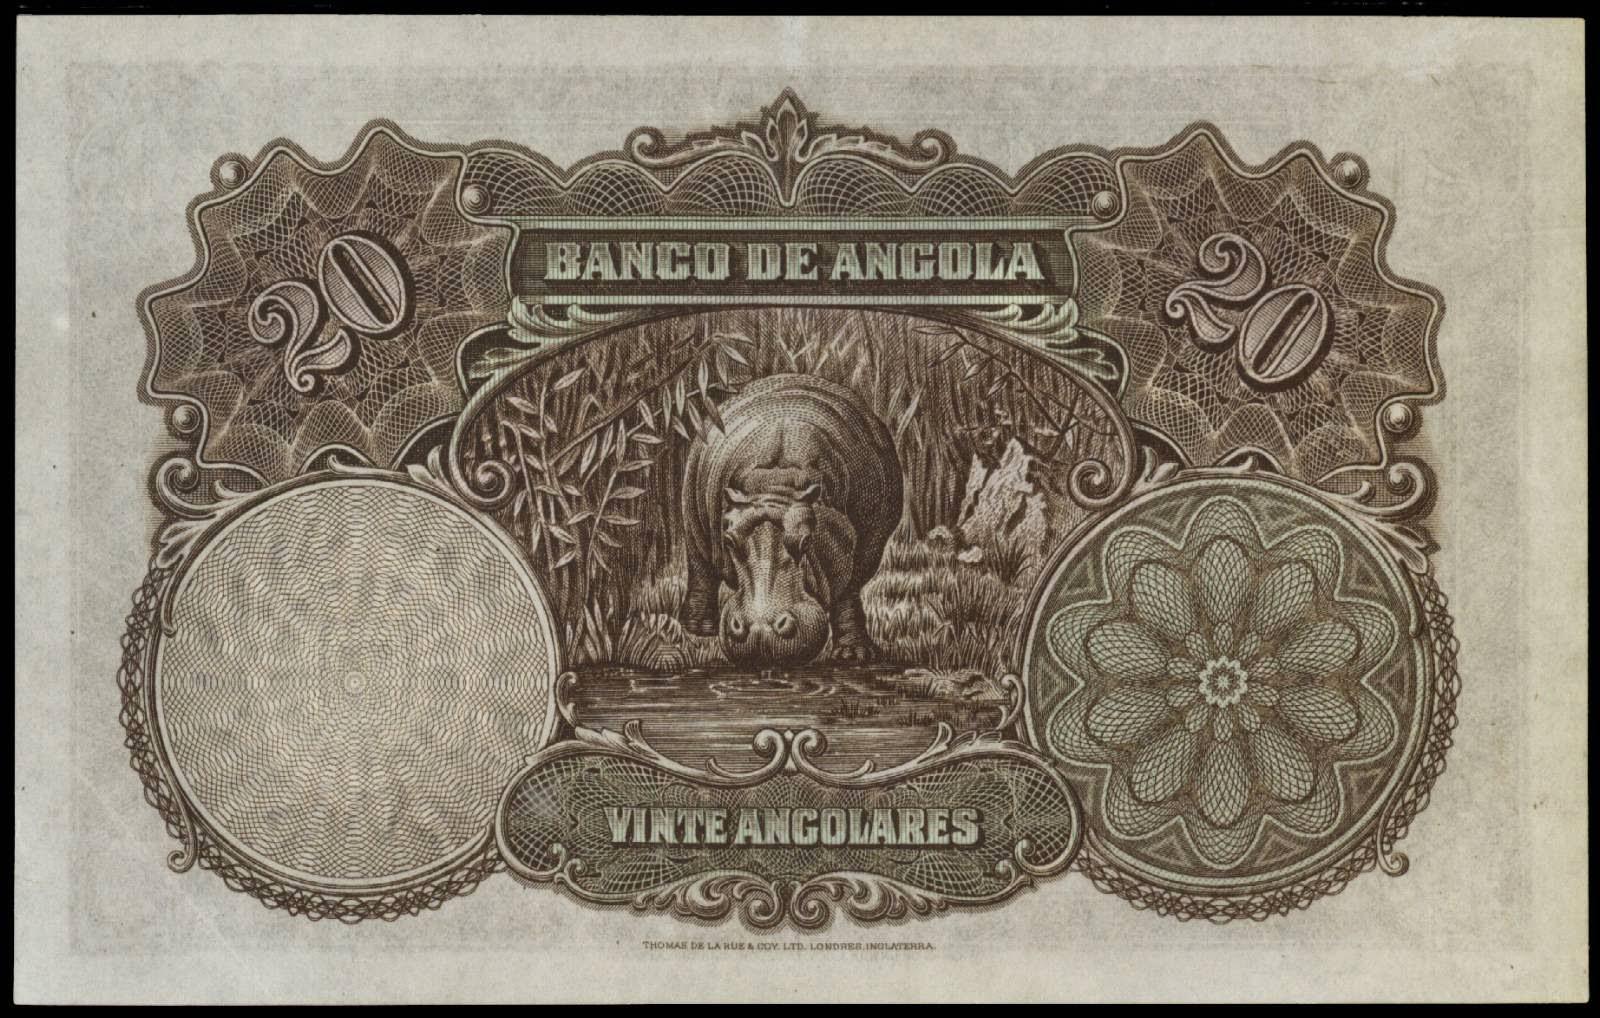 Angola 20 Angolares banknote 1927 Hippopotamus